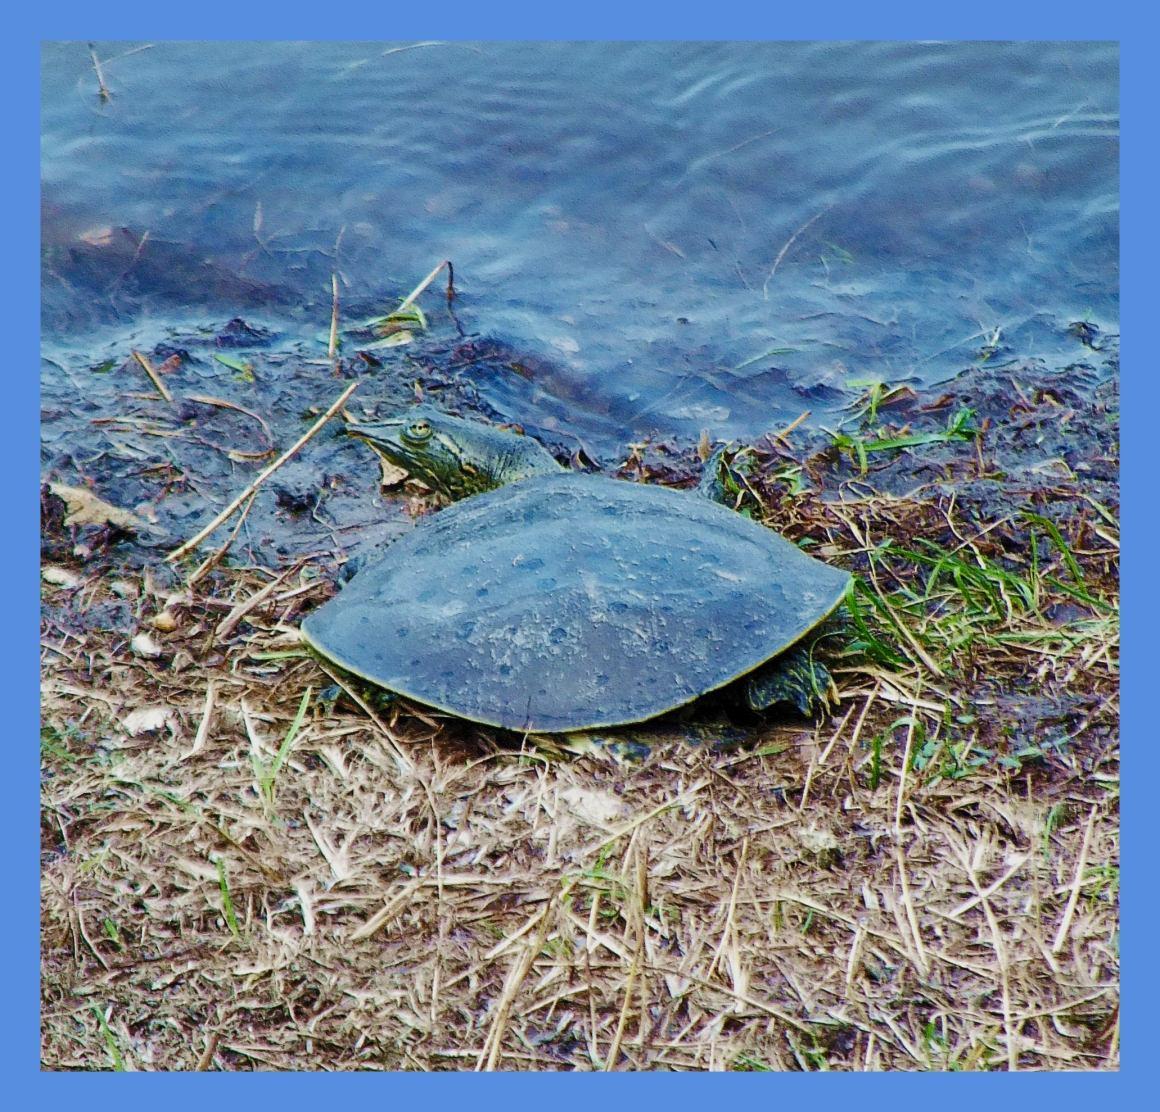 Softshelled Turtle. Photo by Thomas Peace c. 2015